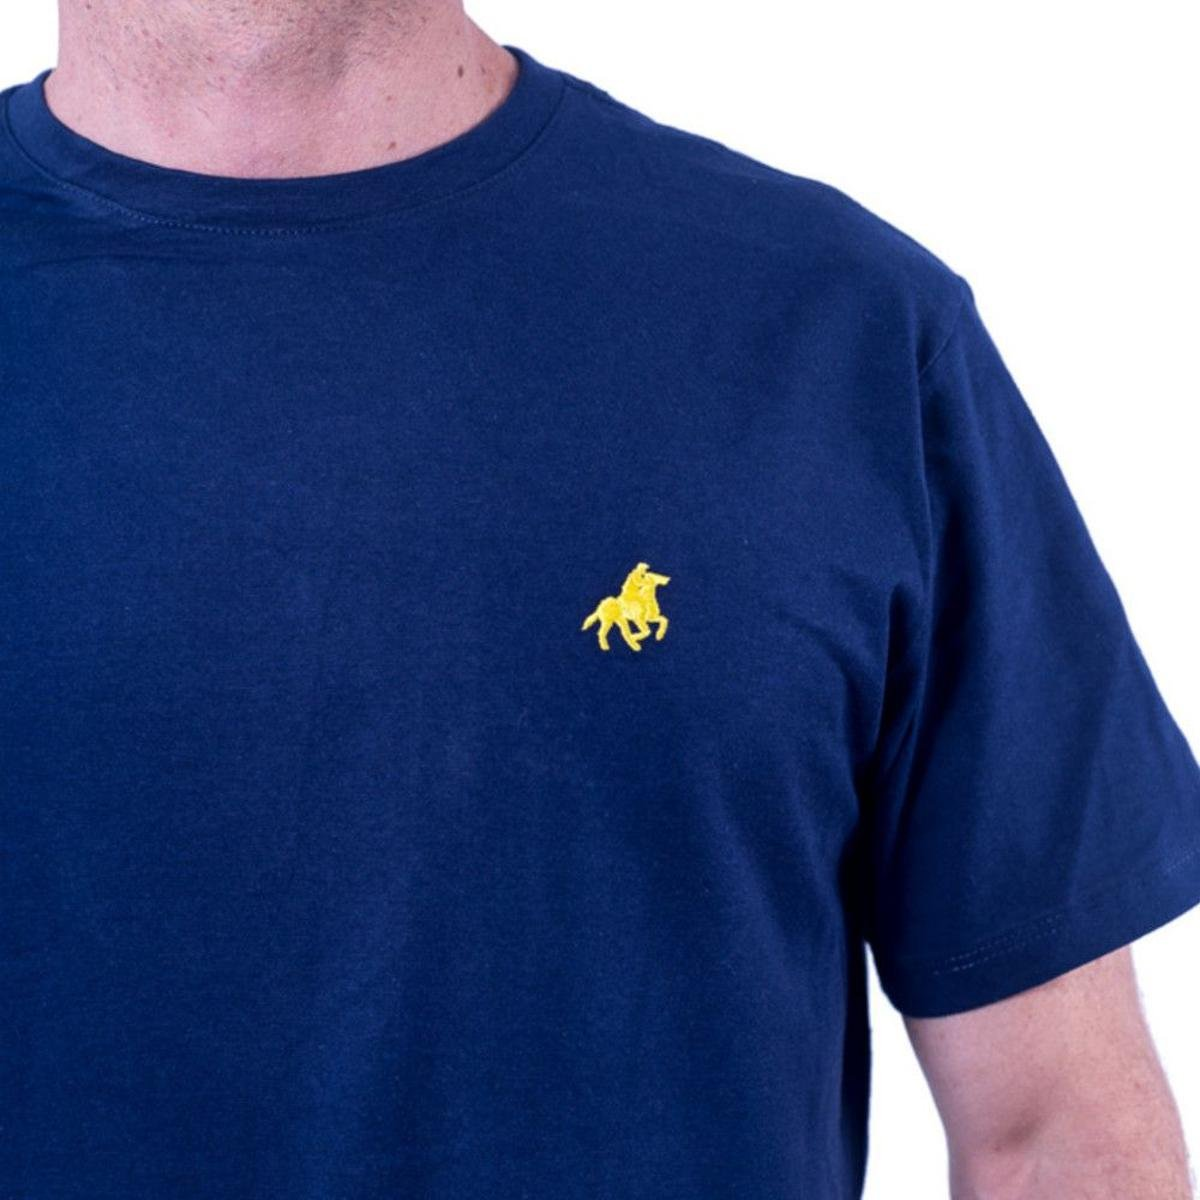 Camiseta England Polo Club Tagless Masculina - Marinho